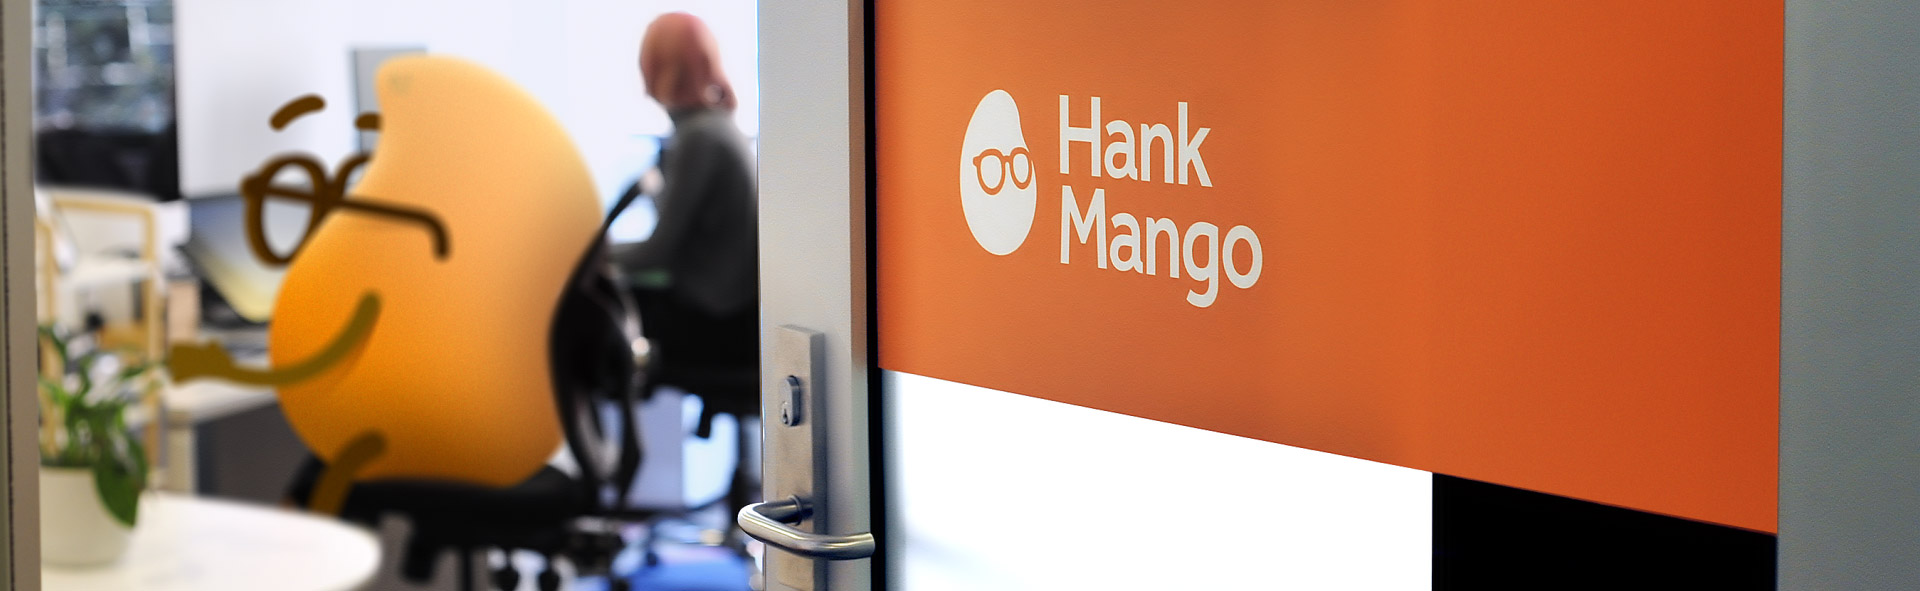 Hank_Mango_Office_SML-3